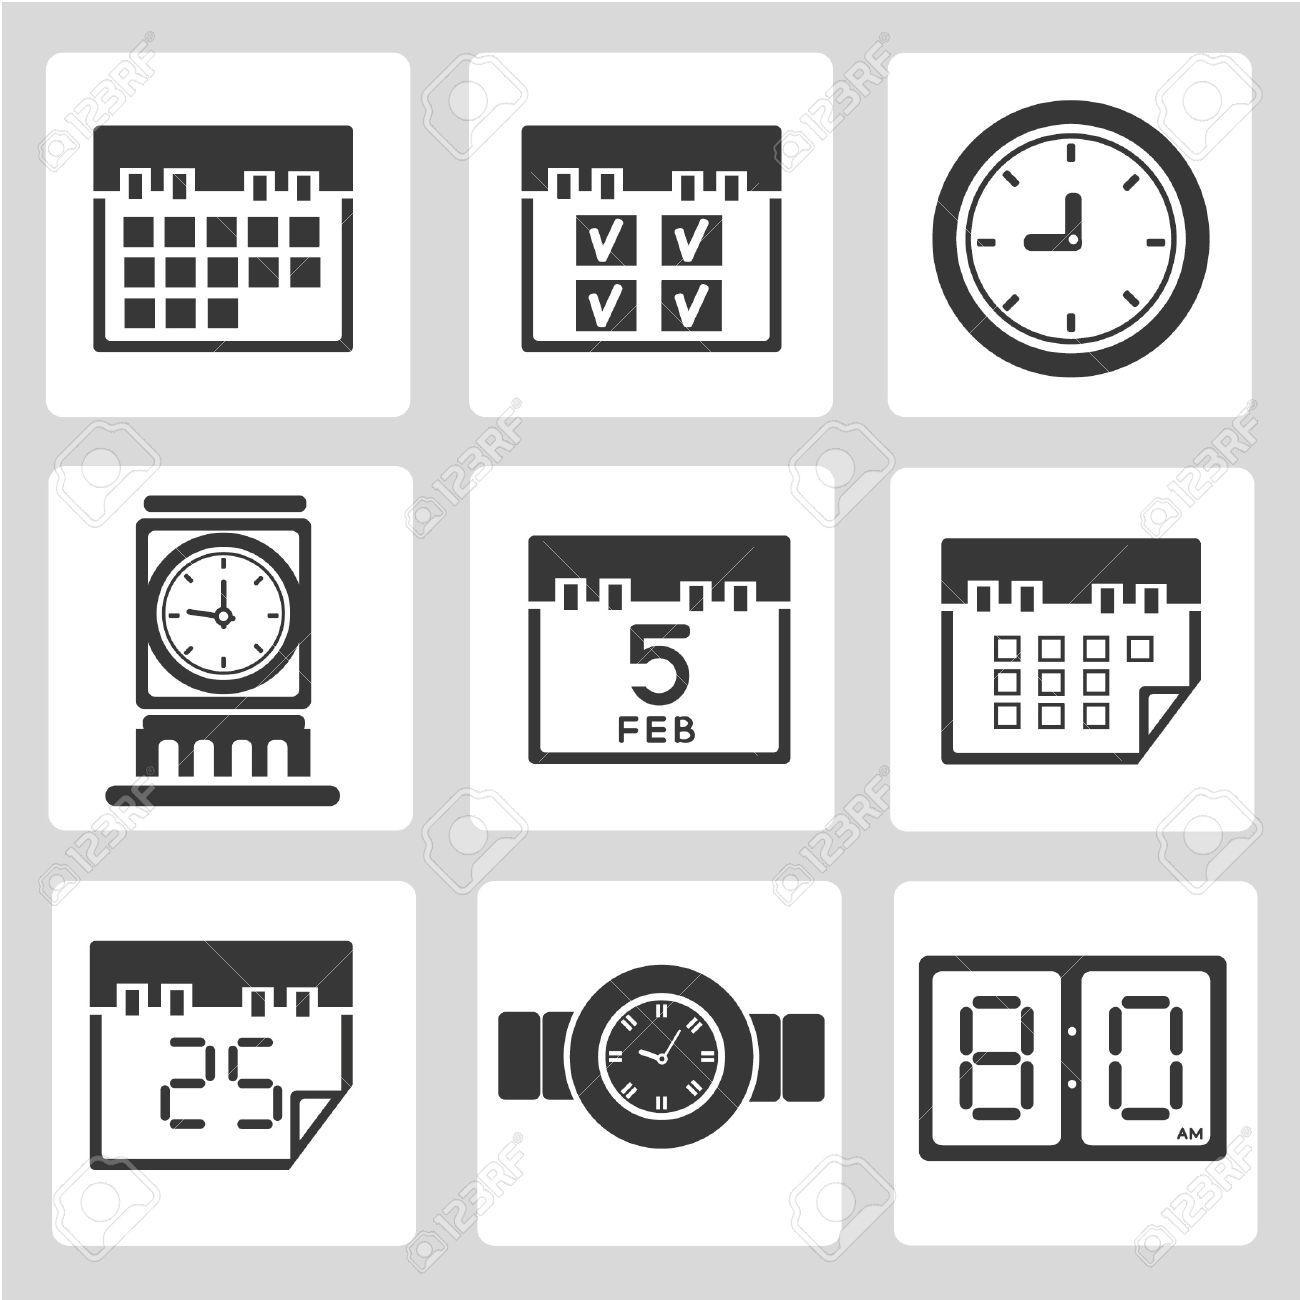 calendar icons set, schedule icons Stock Vector - 20282260